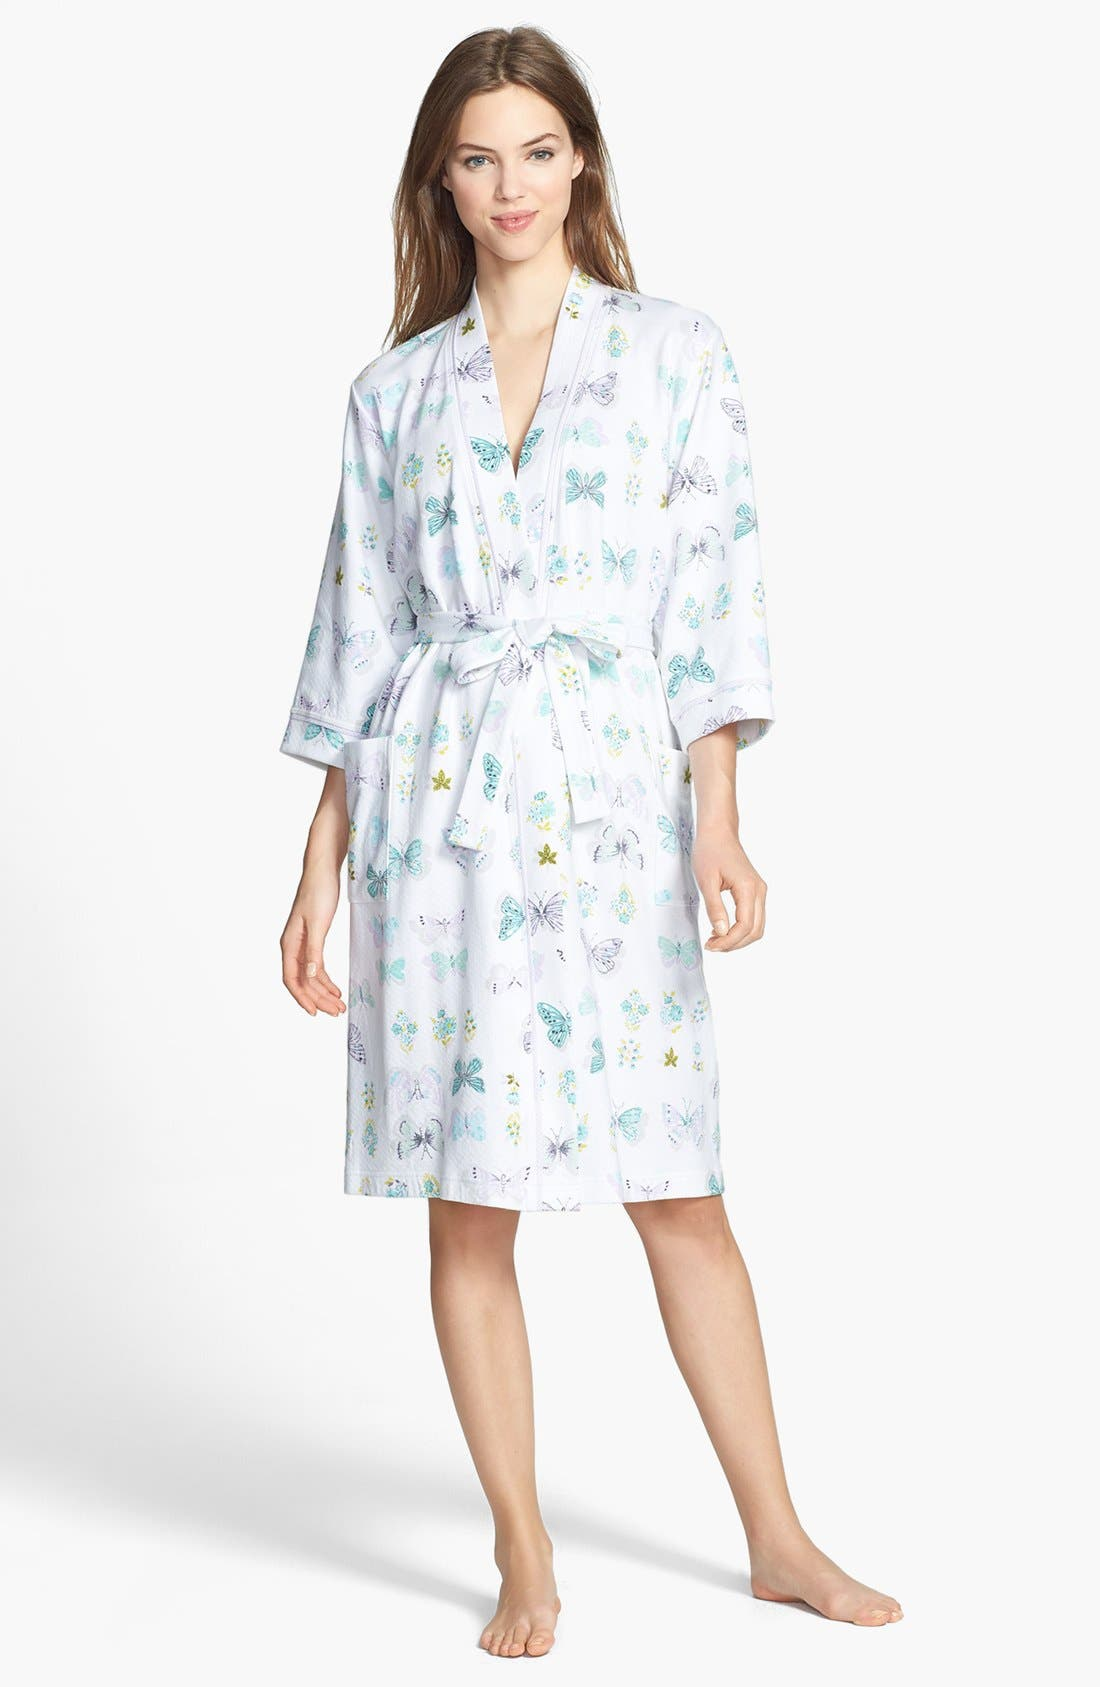 Main Image - Carole Hochman Designs 'Butterfly Soiree' Robe